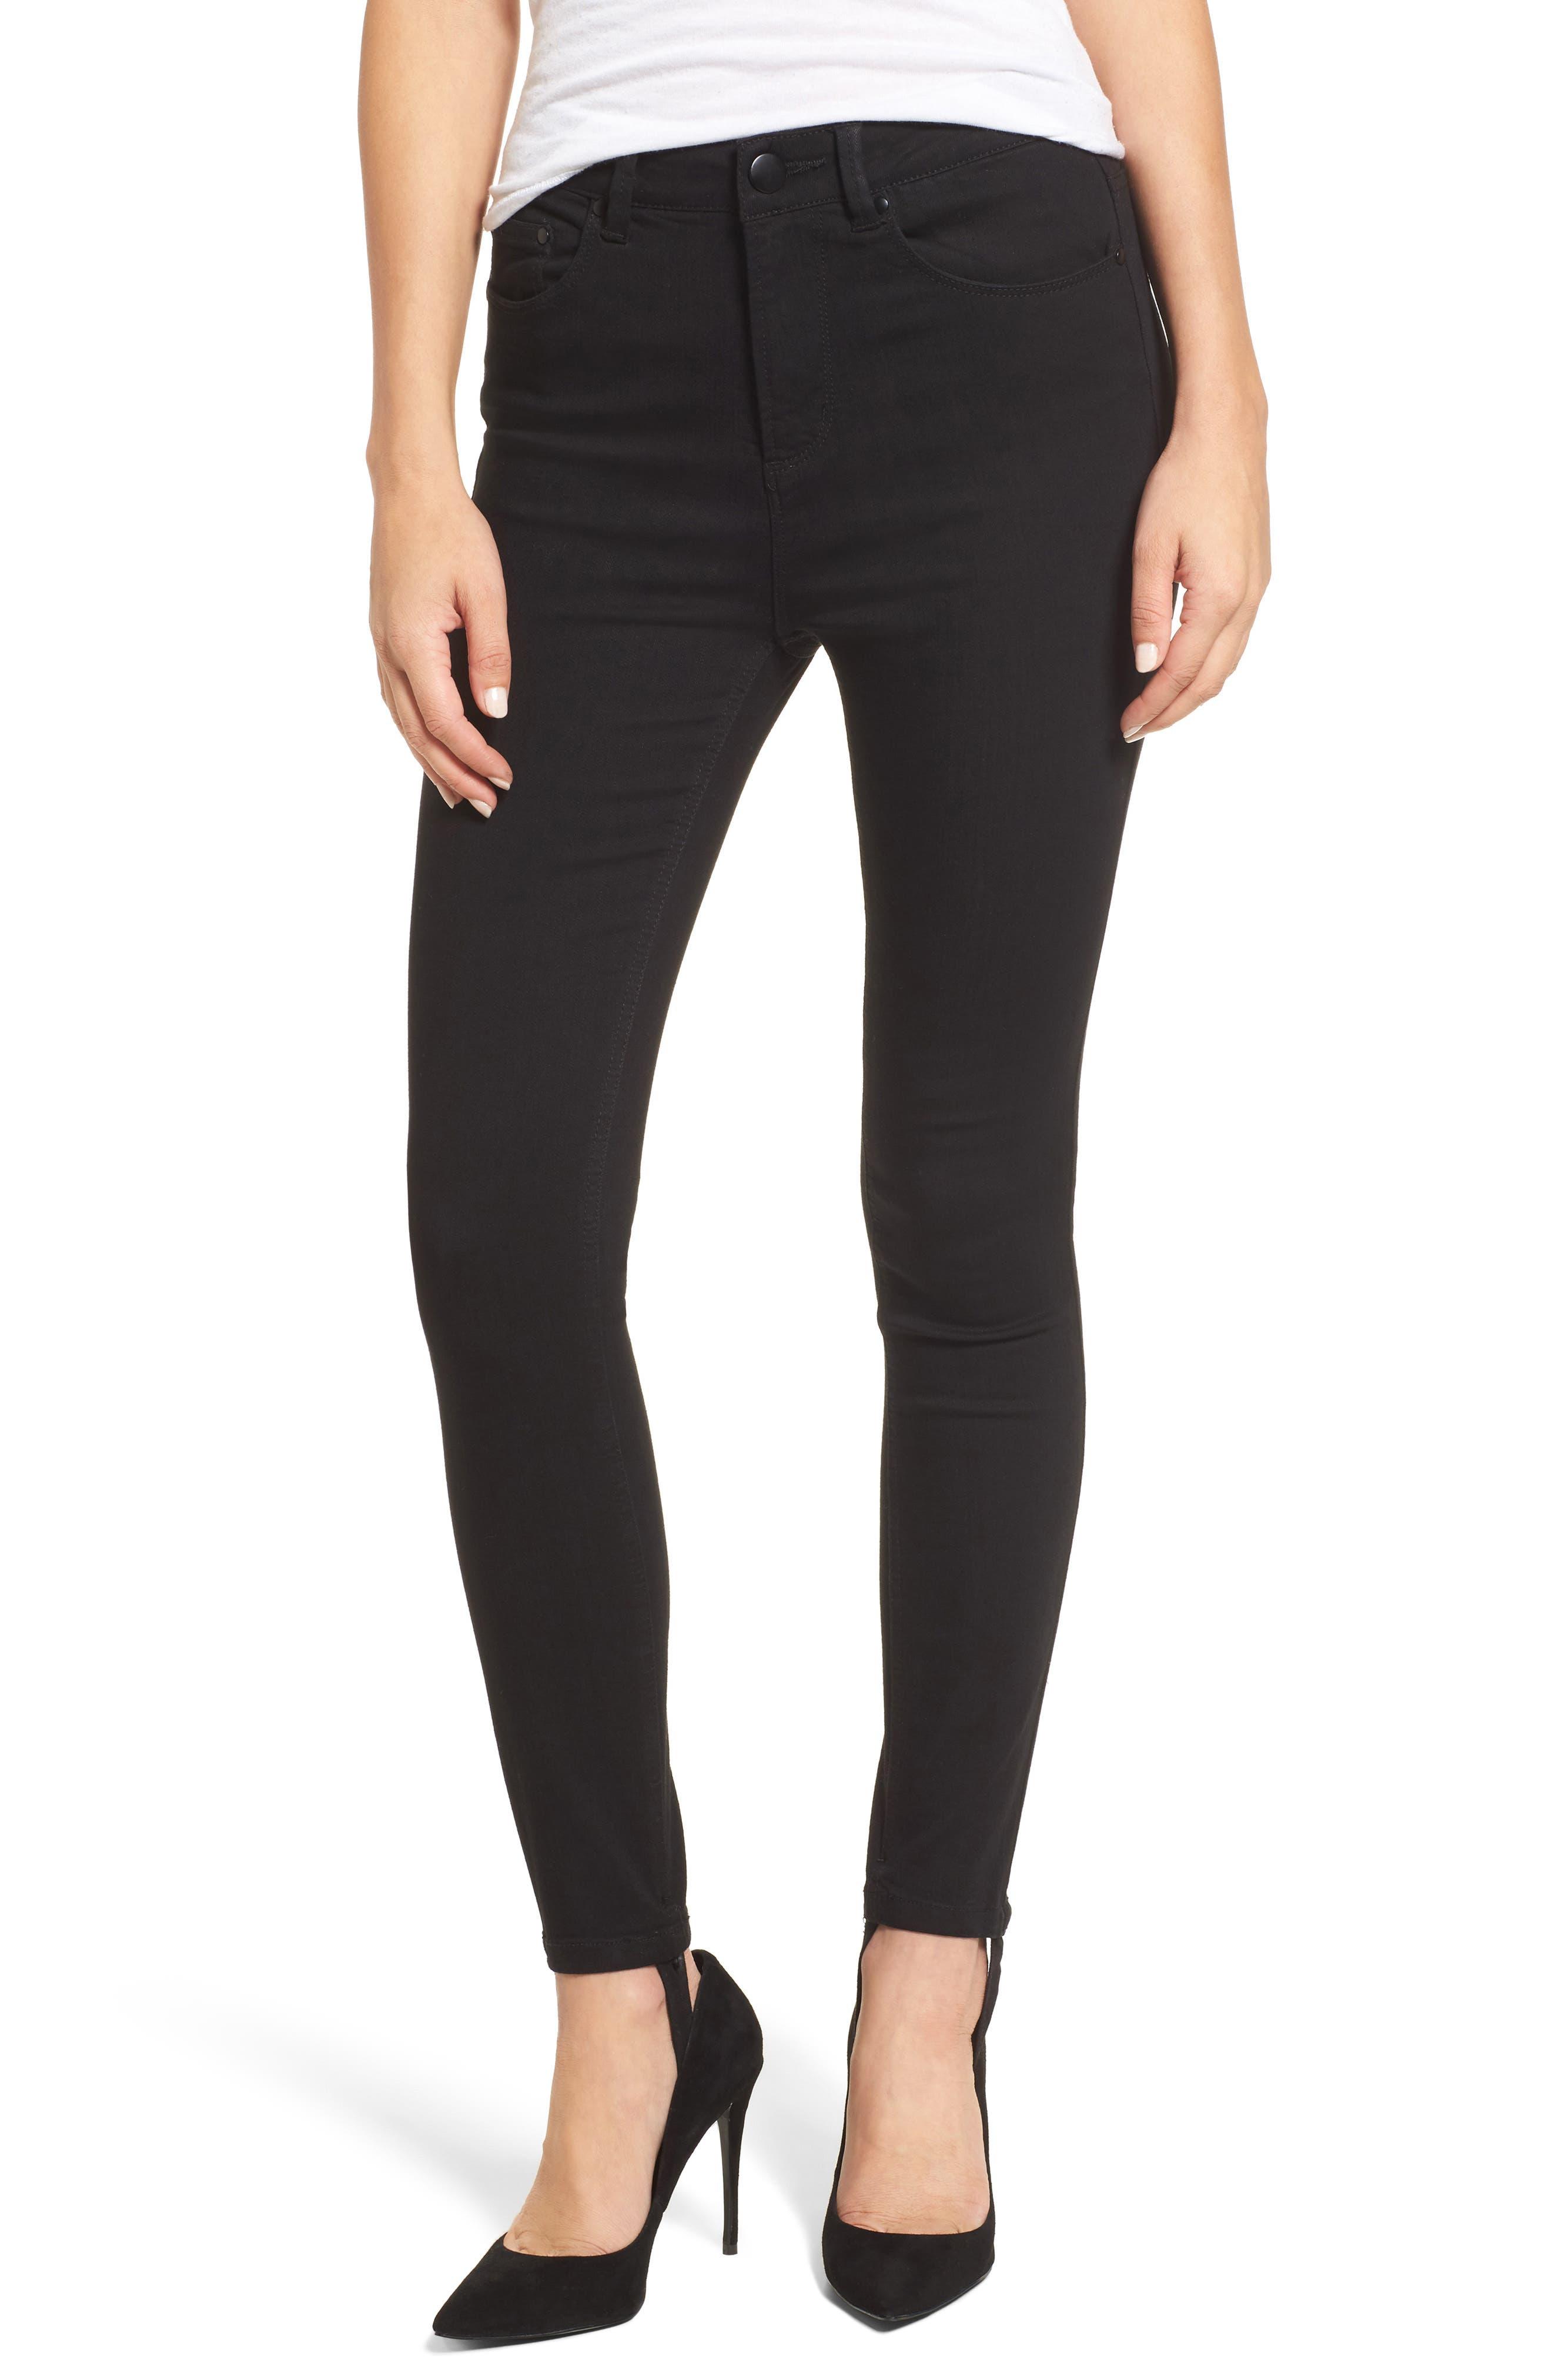 Main Image - AFRM Luma High Waist Skinny Stirrup Jeans